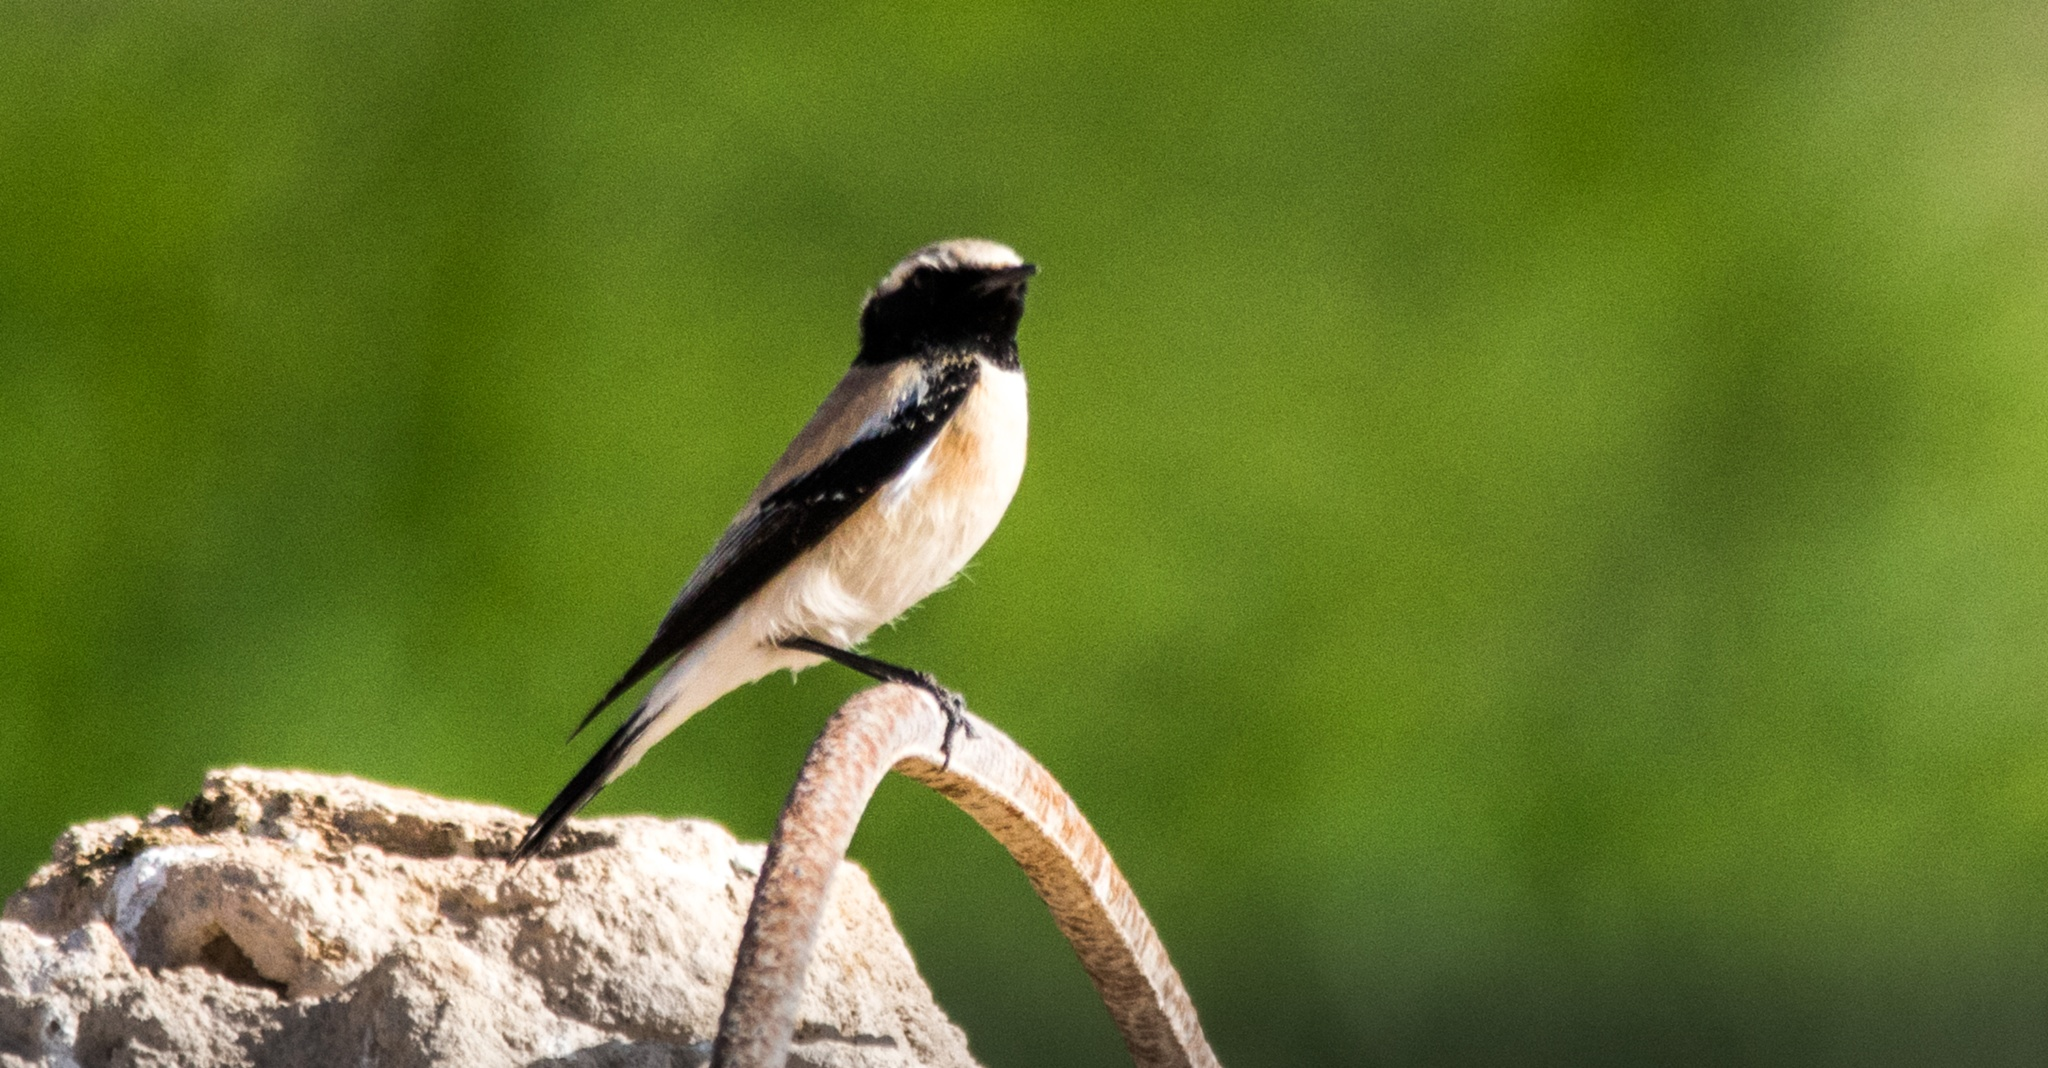 Black eared wheatear by Sajeev Kumar